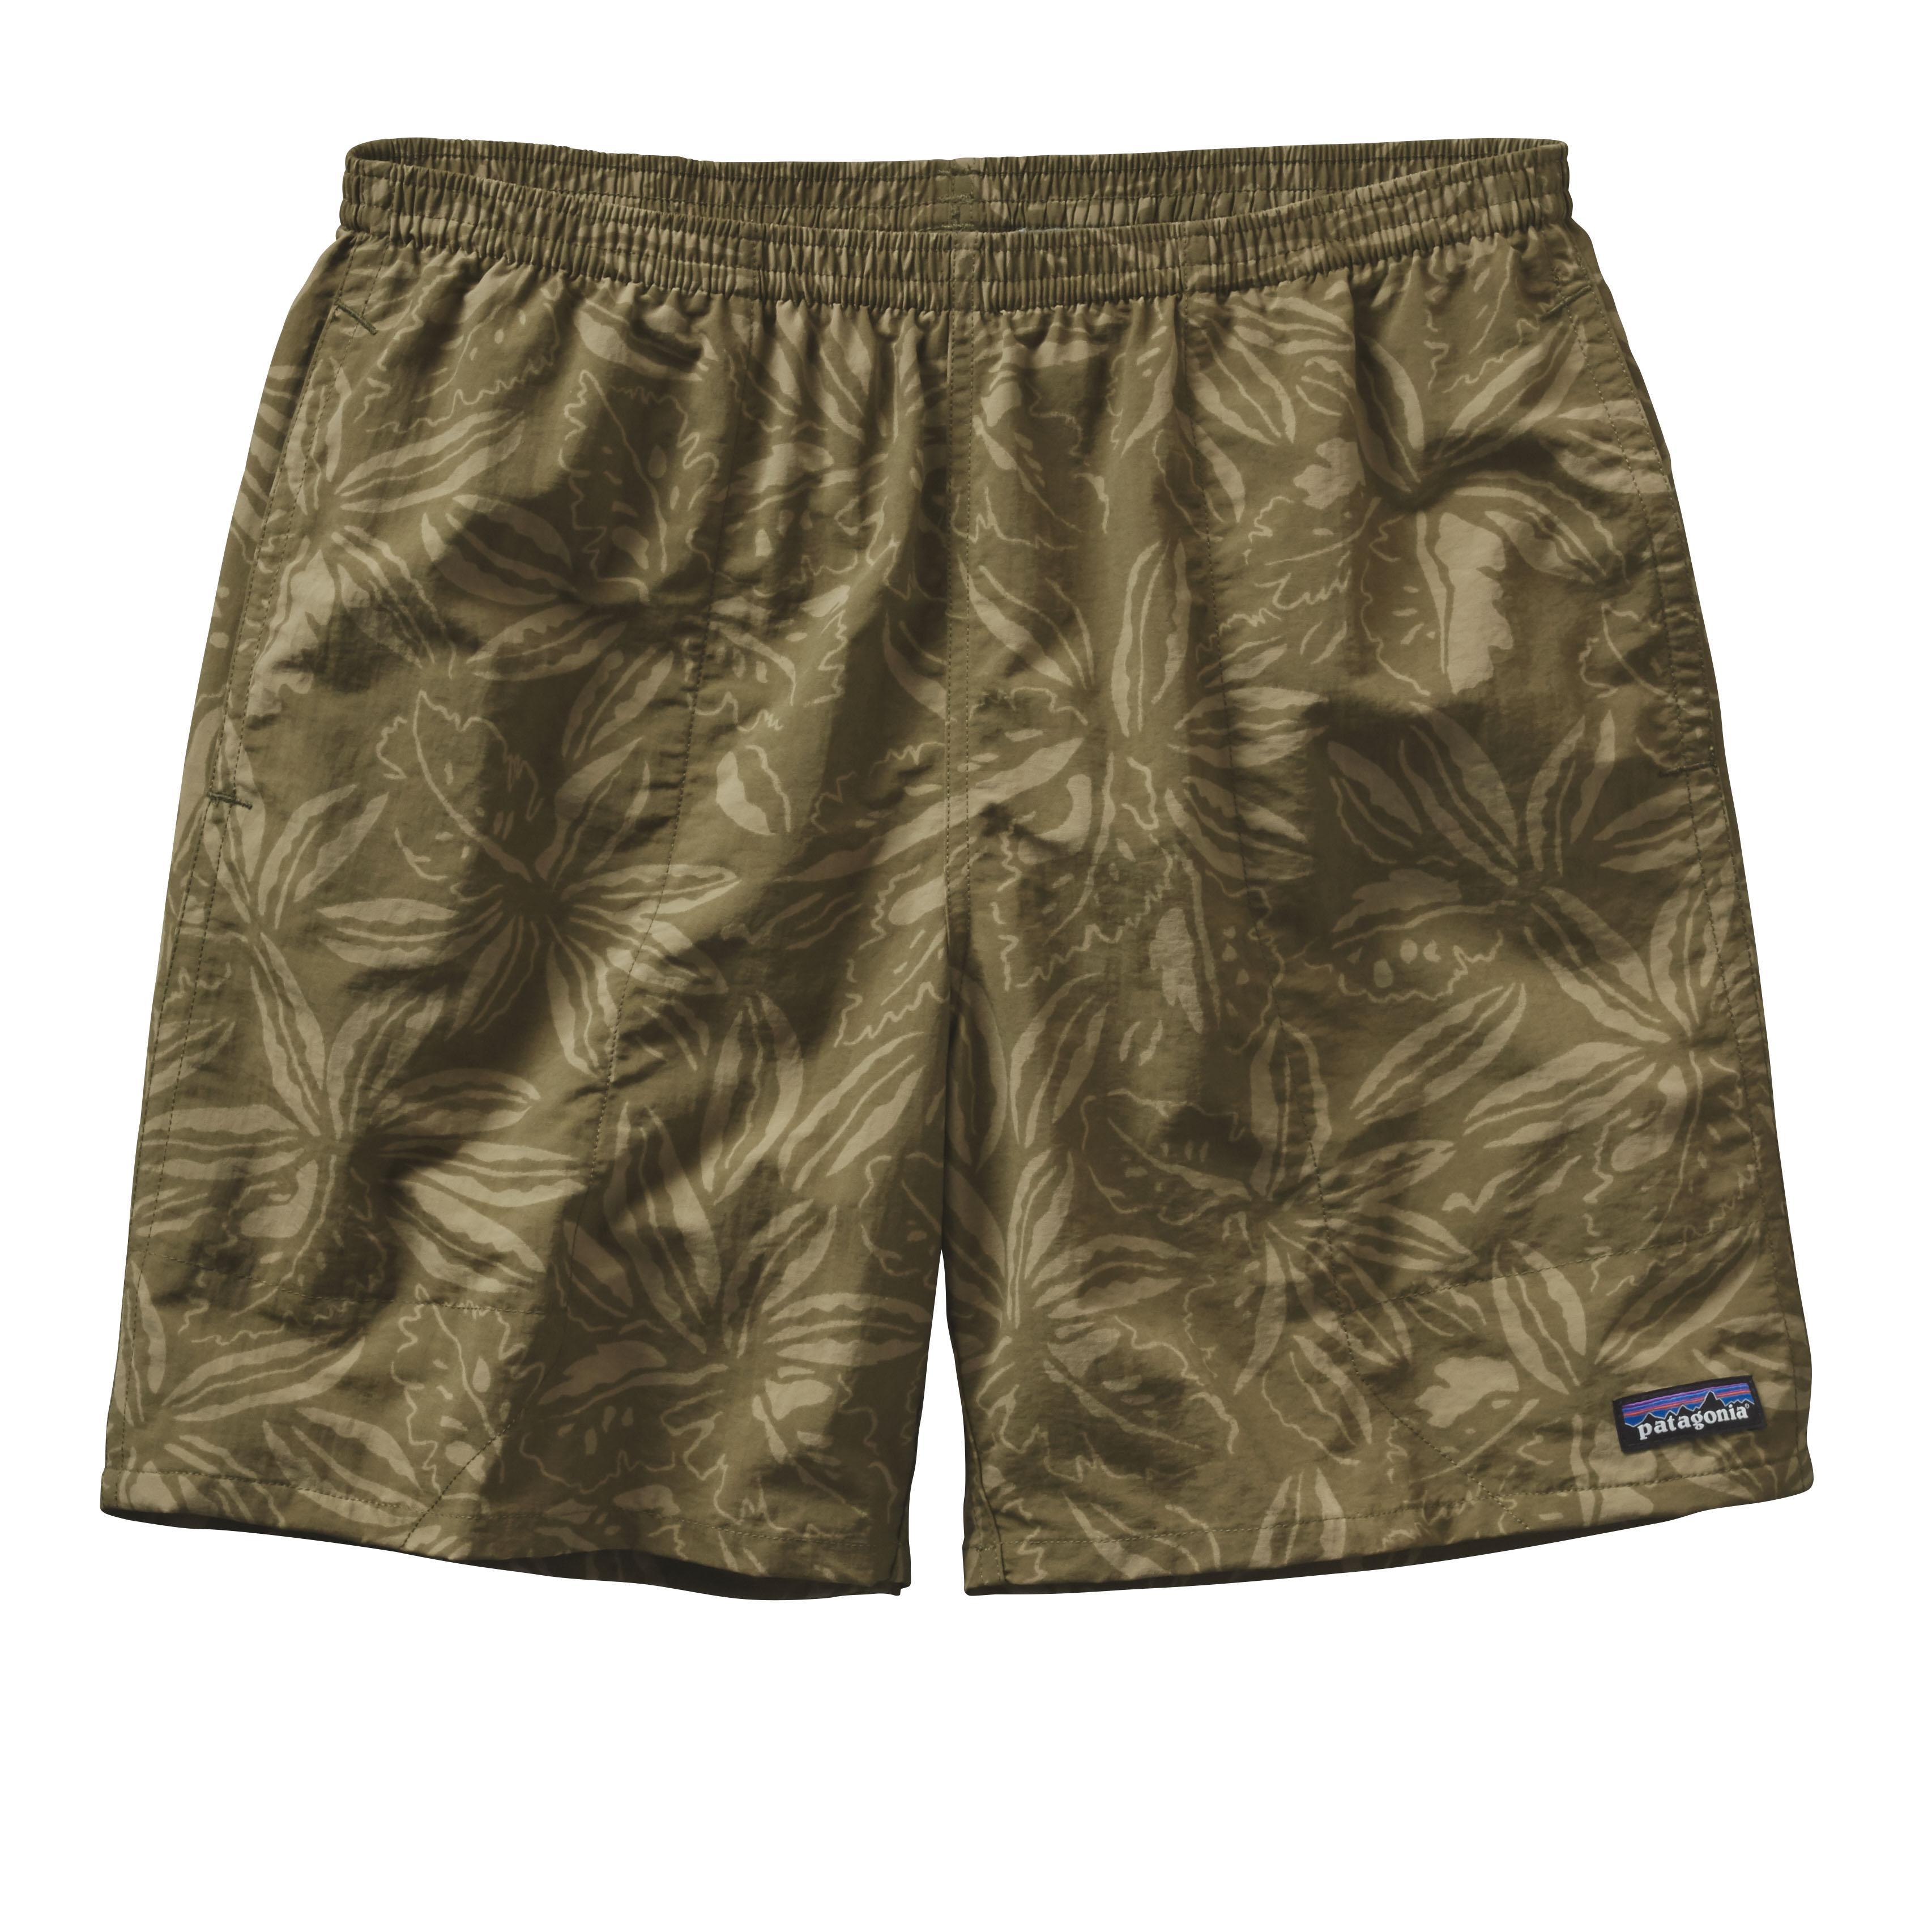 Patagonia Men's Baggies Shorts 7in Inseam TRPF_GREEN